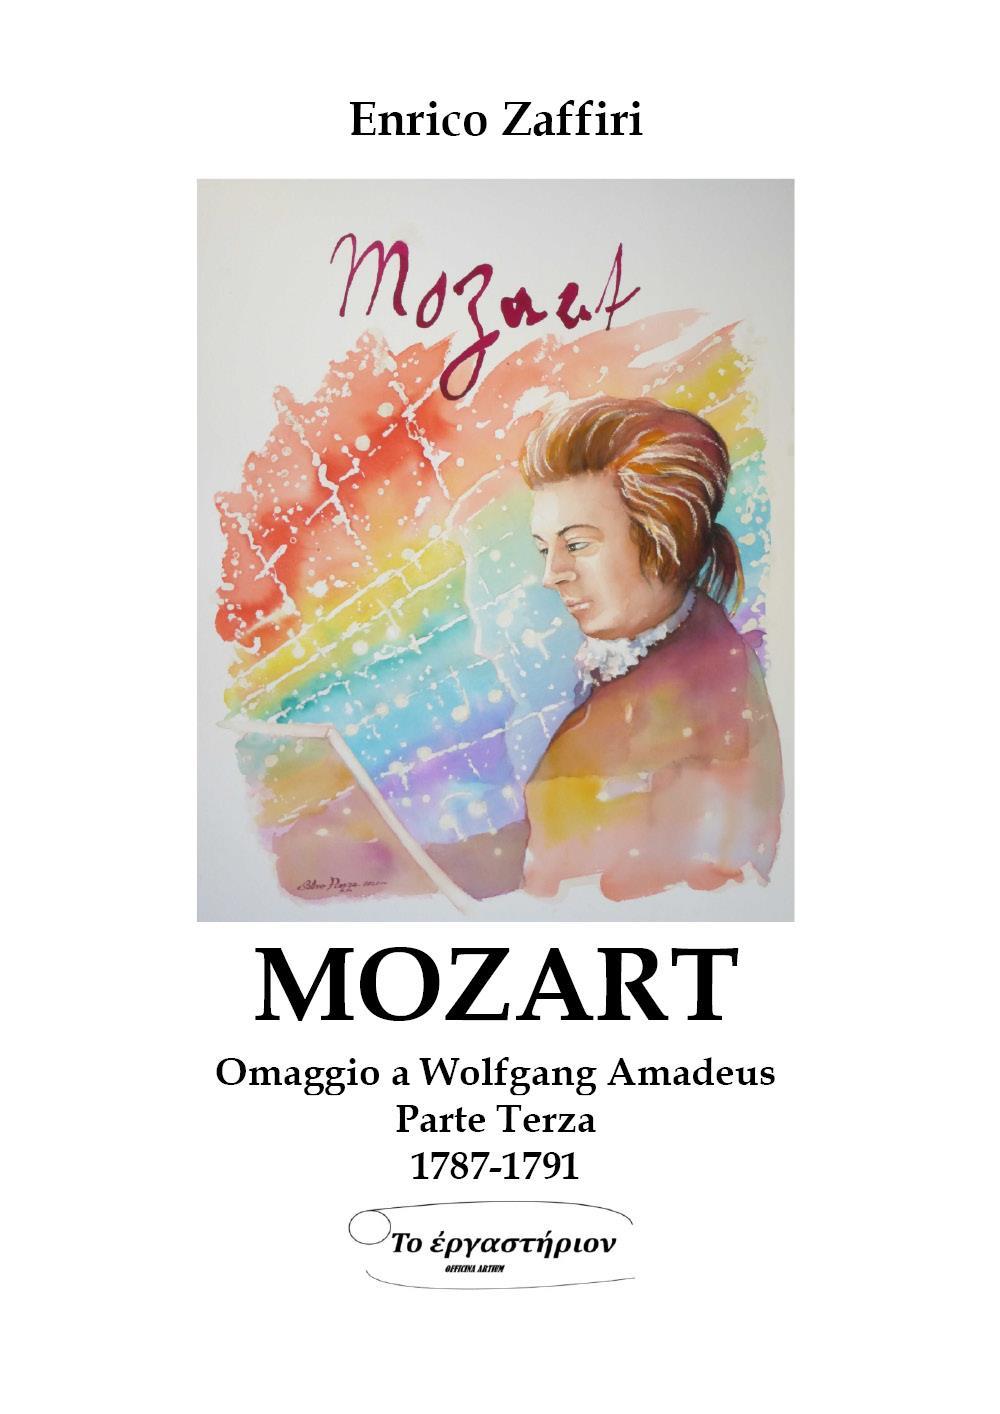 MOZART - Omaggio a Wolfgang Amadeus - Parte Terza - 1787-1791